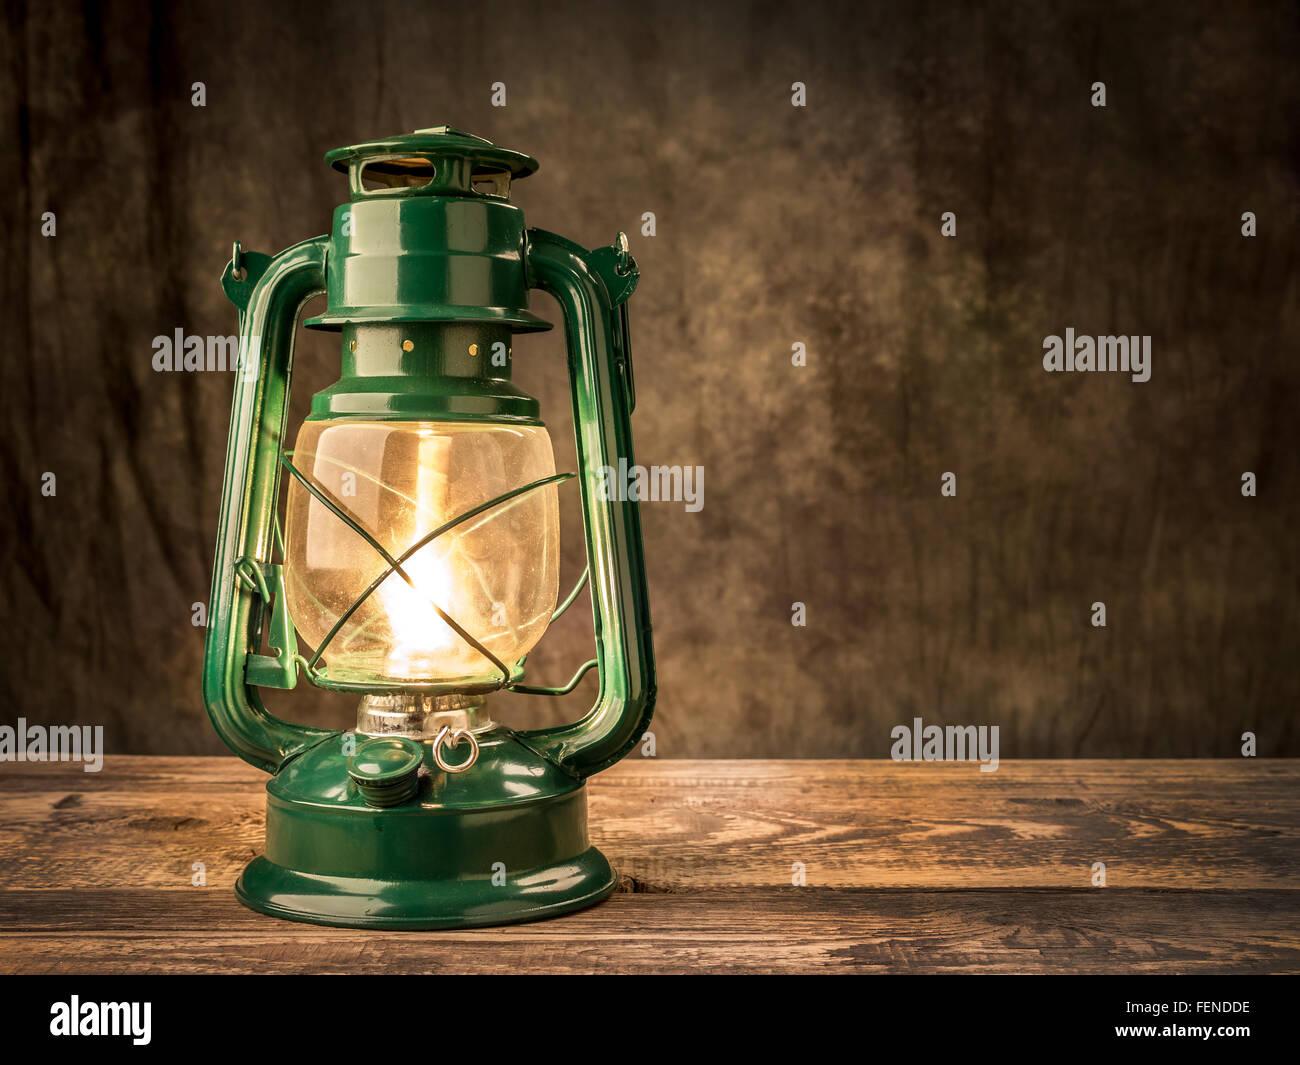 Vintage oil lamp lit on wooden table over dark background - Stock Image